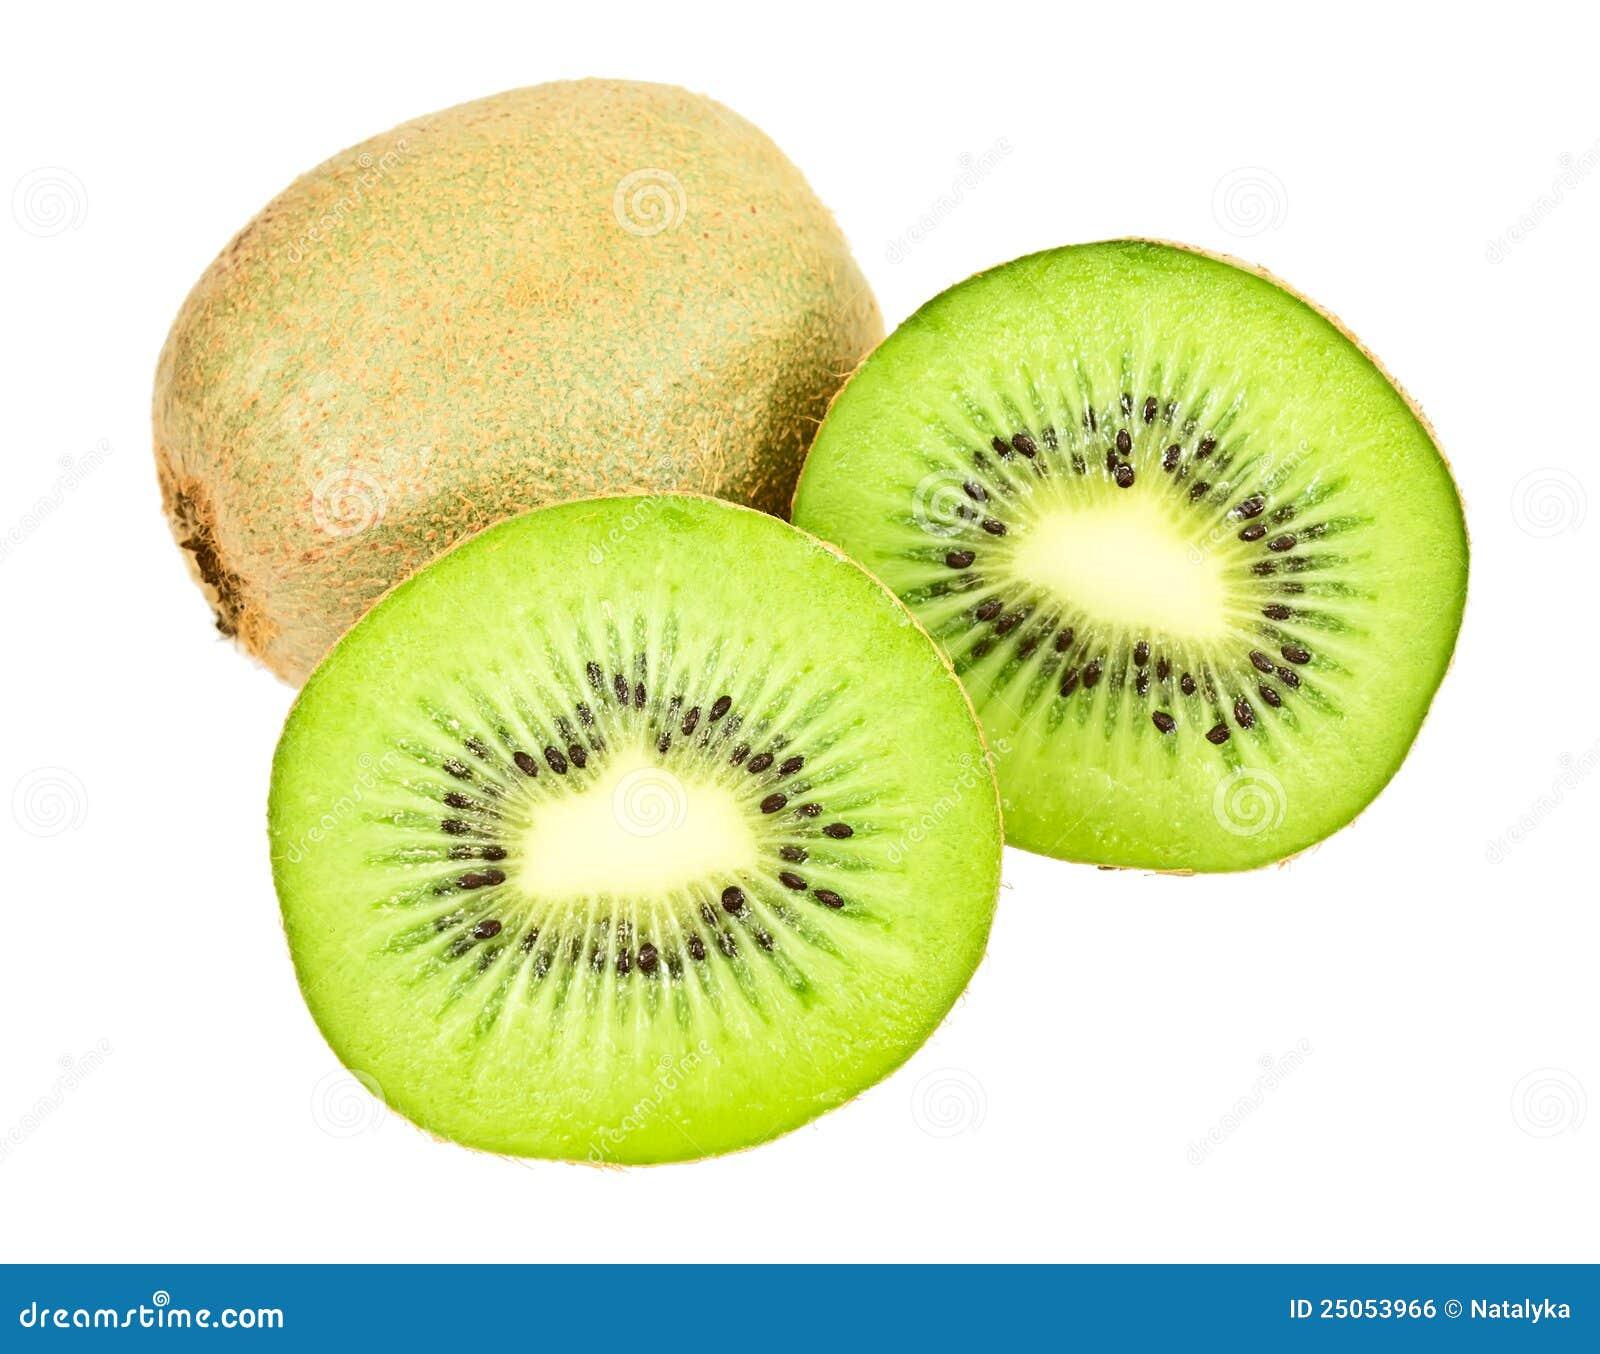 Kiwi fruit cut in half close up - Kiwi Cut In Half Www Imgkid Com The Image Kid Has It